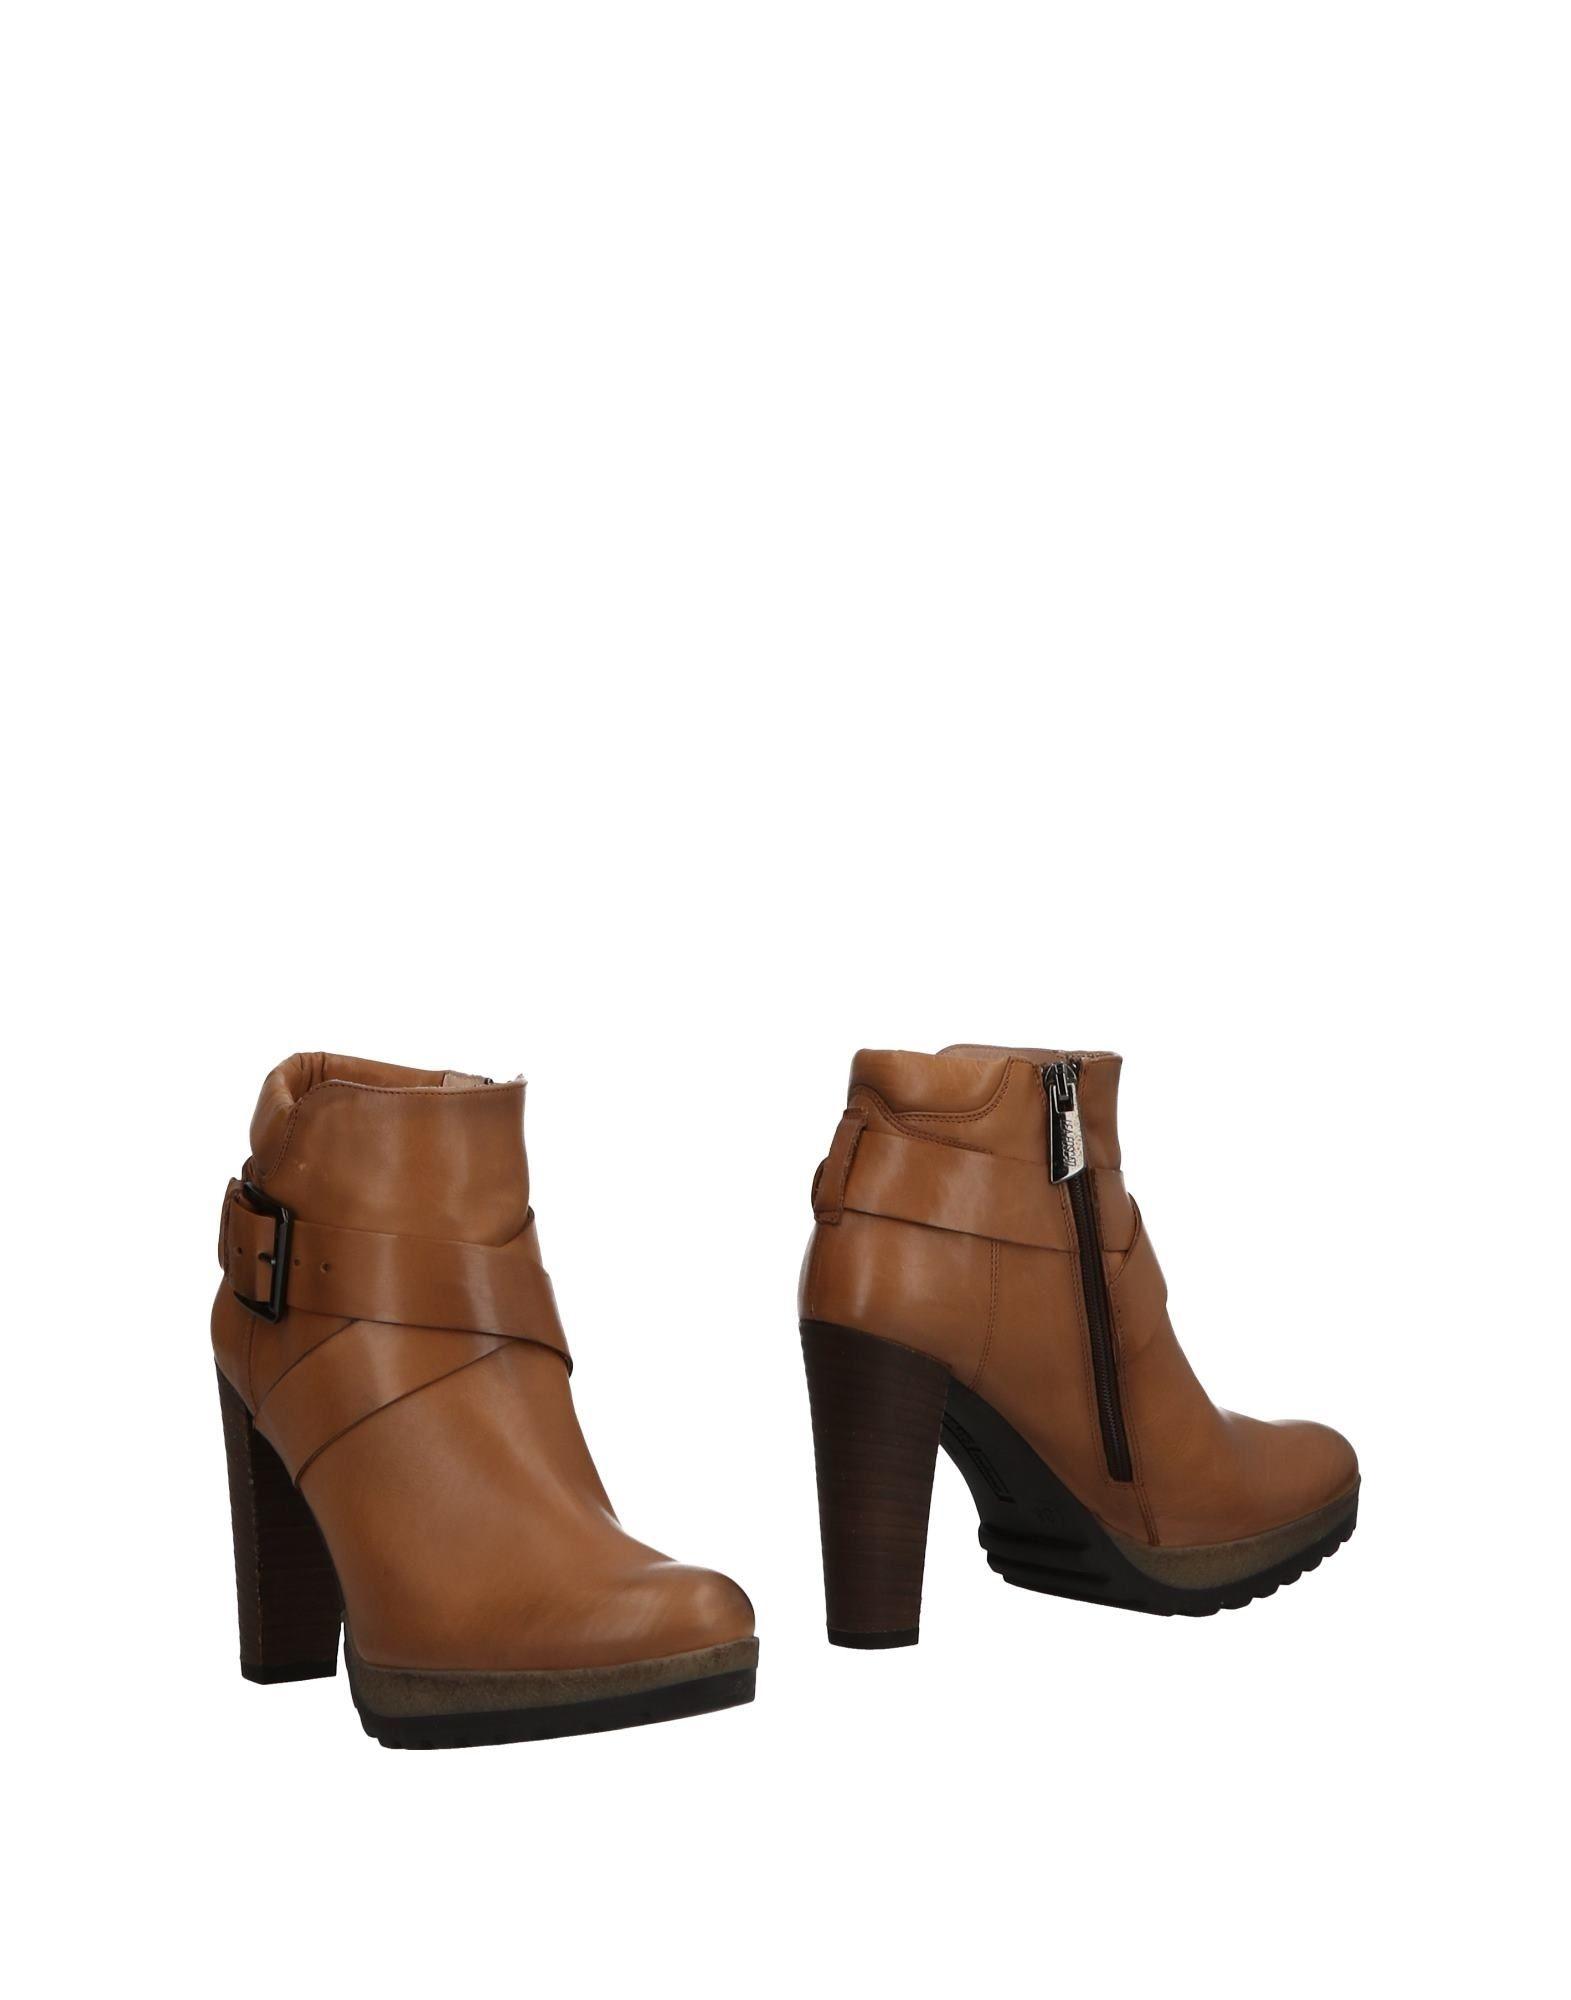 Manas Lea Foscati 11502233TQ Stiefelette Damen 11502233TQ Foscati Gute Qualität beliebte Schuhe d015b7